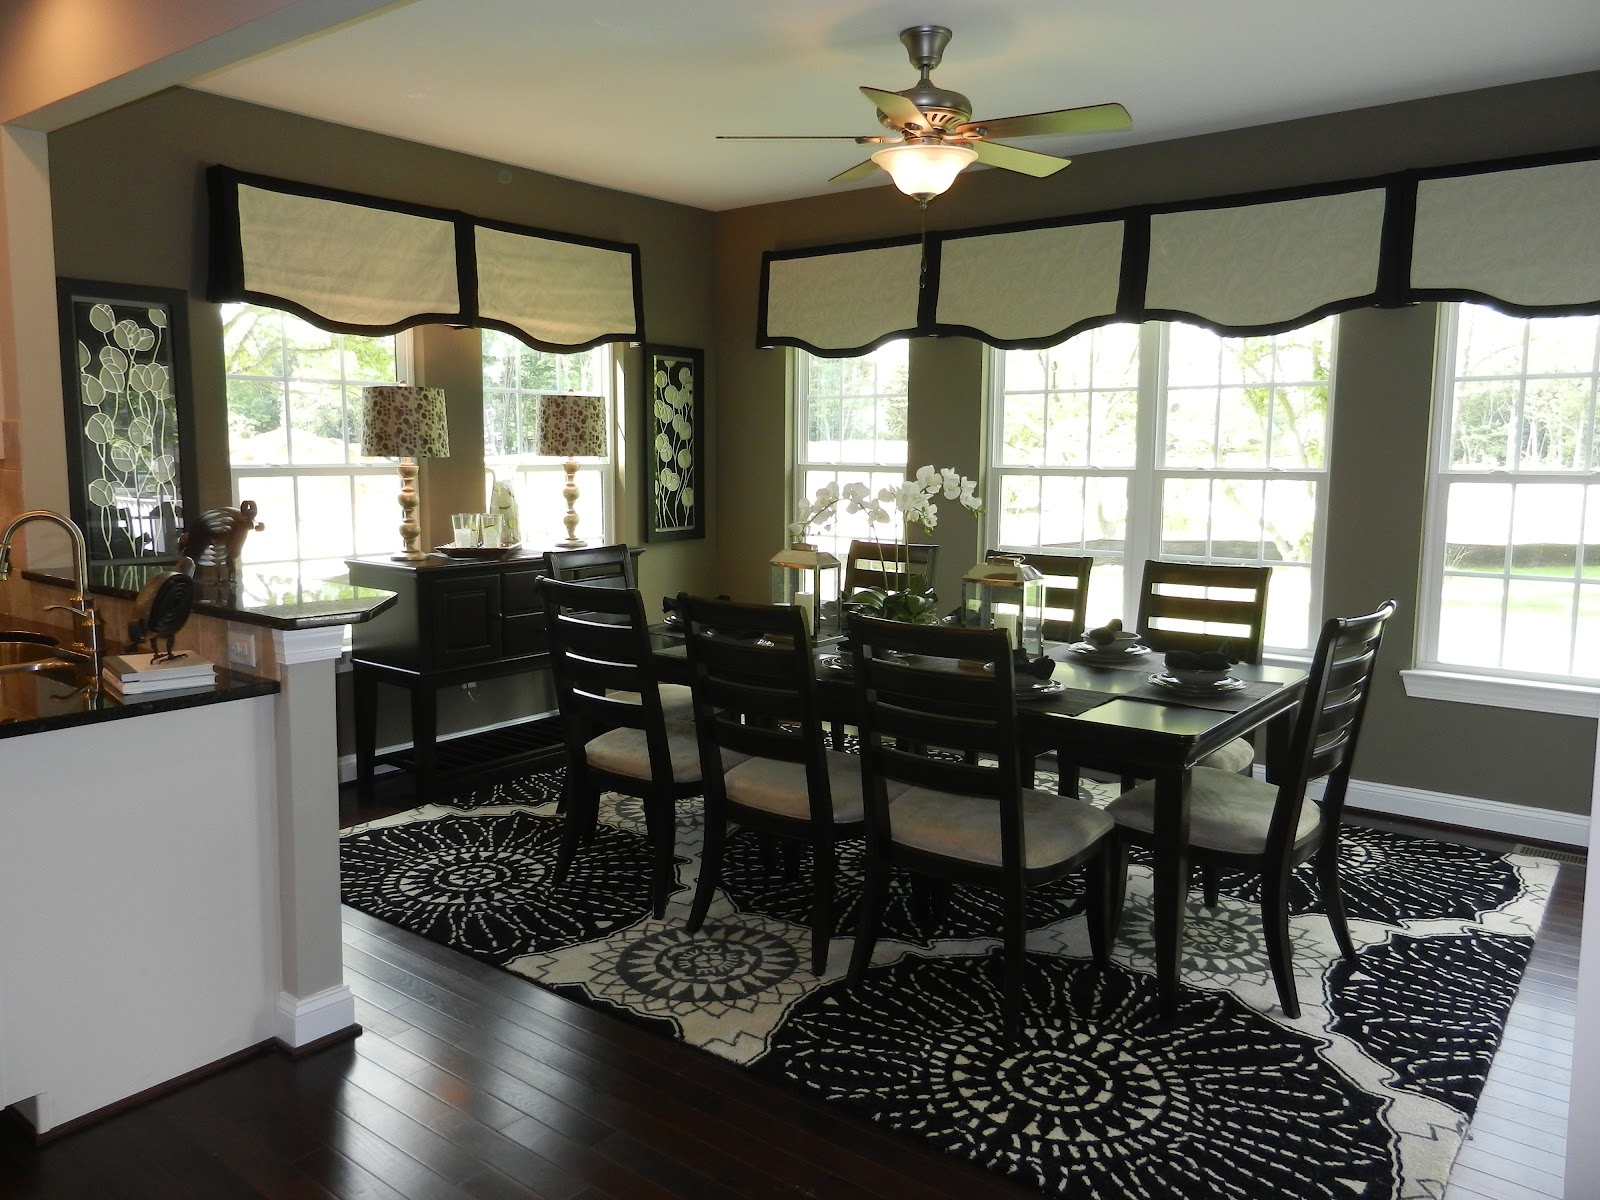 Morning room furniture homesfeed for Morning room designs